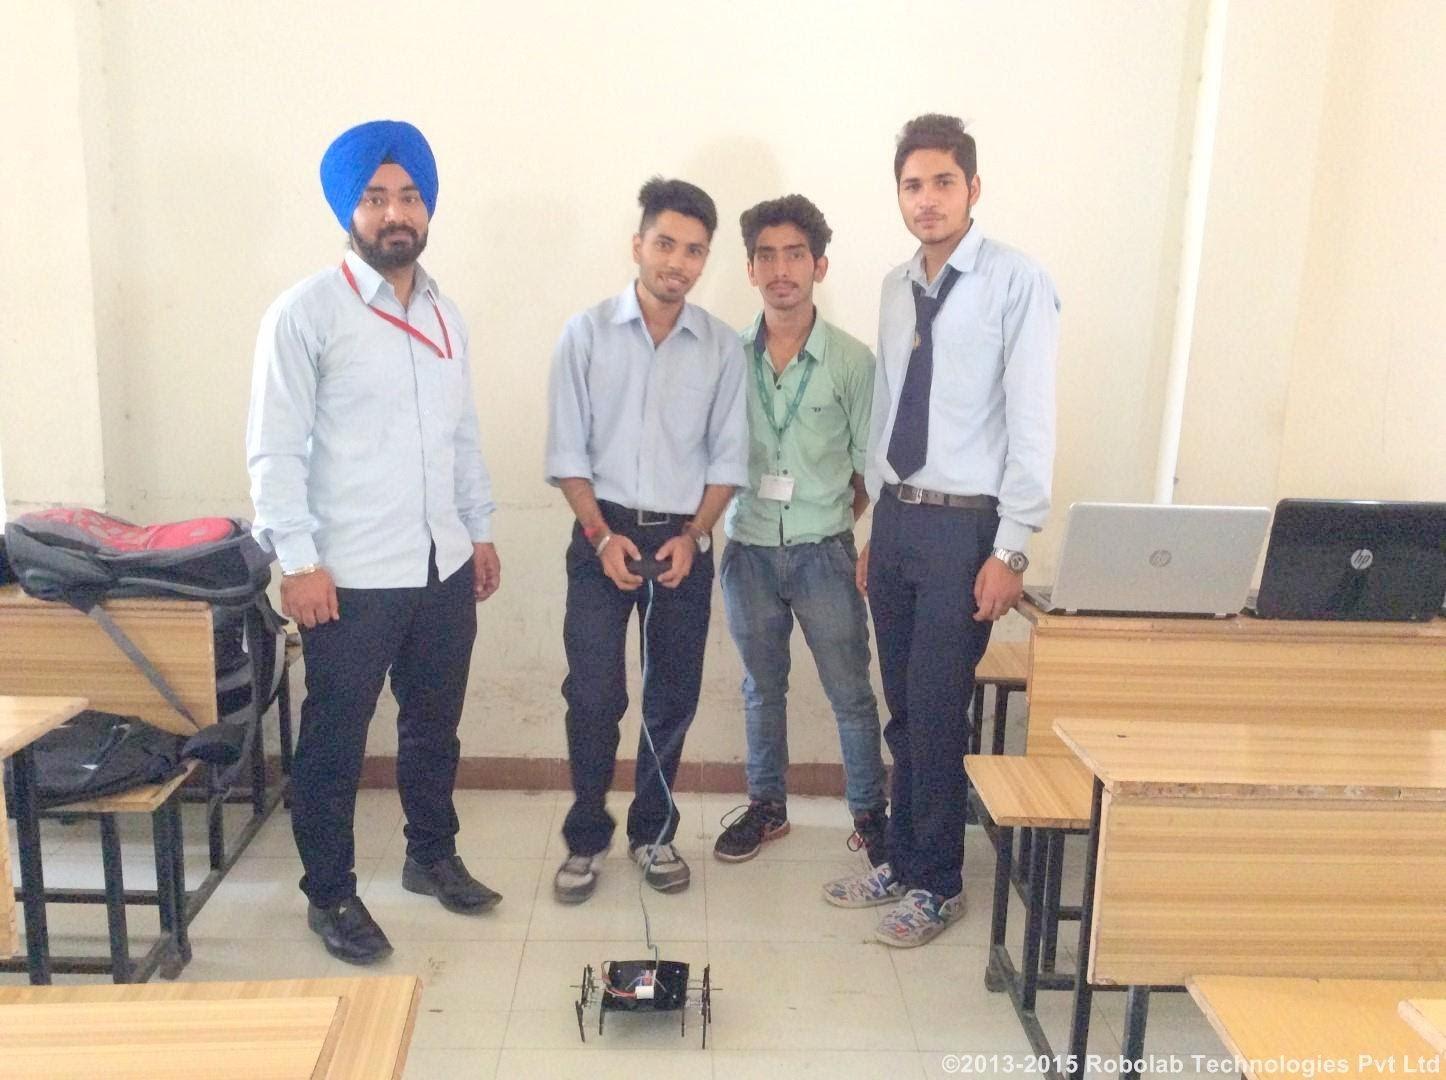 Amritsar College Of Engineering and Technology, Amritsar Robolab 15 (24).jpg